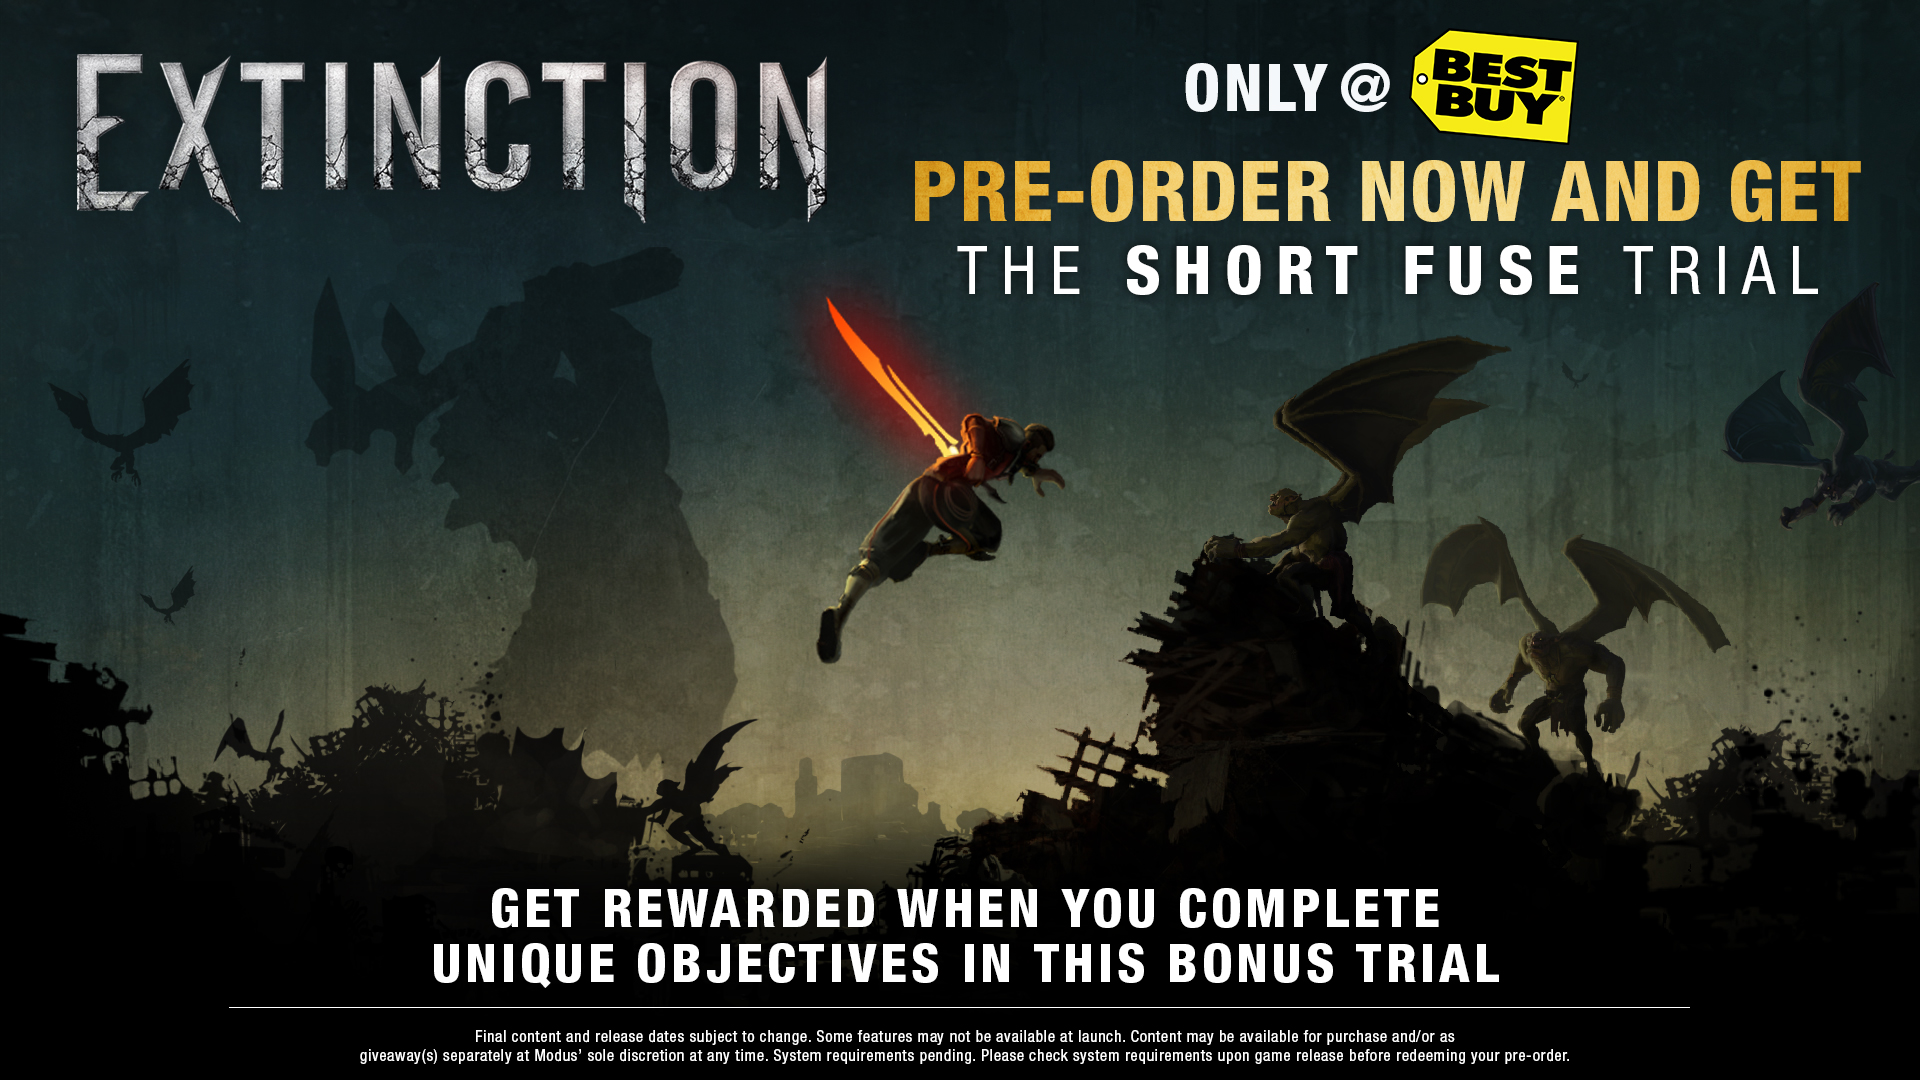 Extinction - Best Buy pre-order incentive